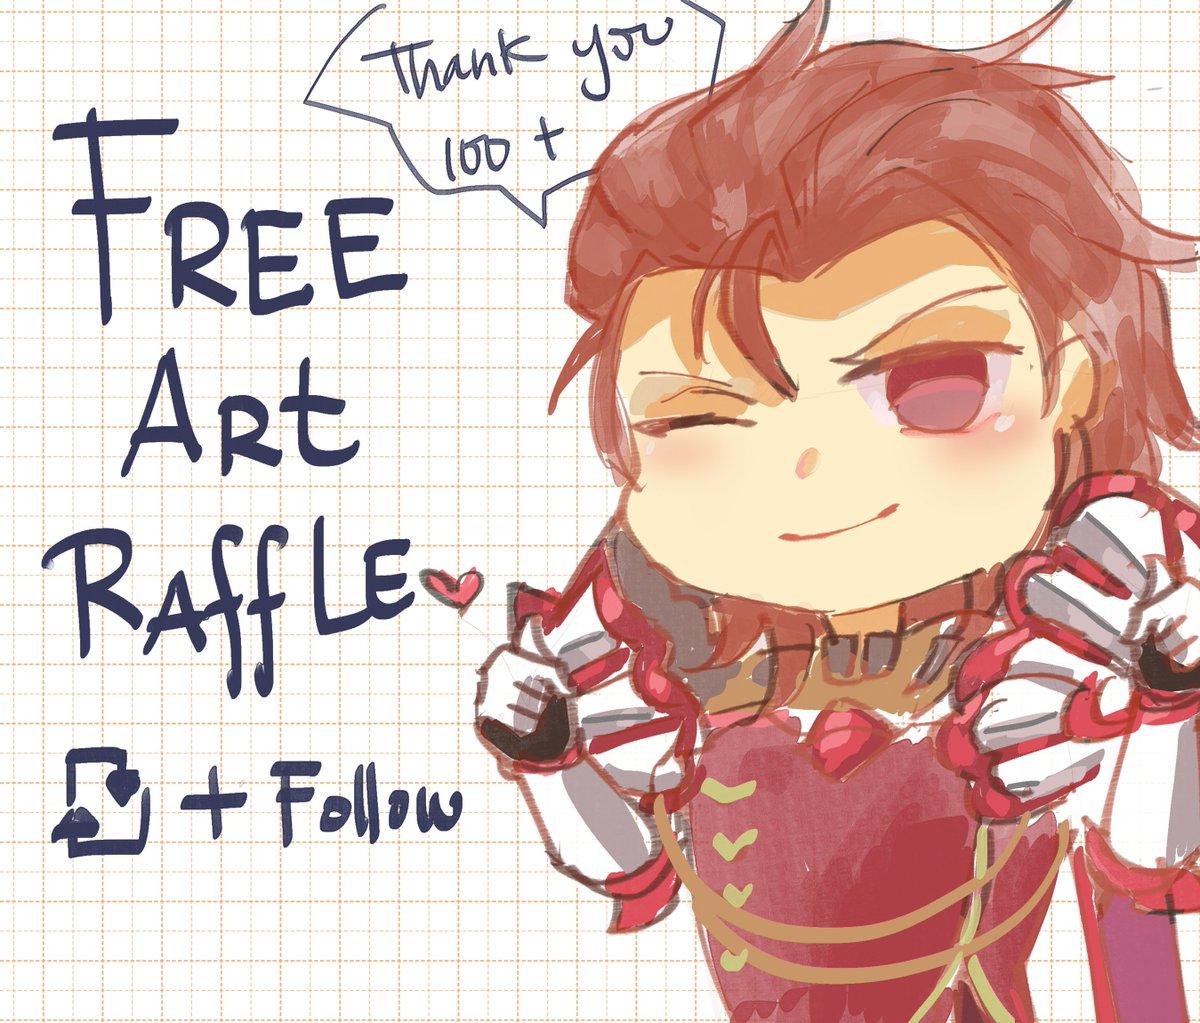 so tomorrow is my birthday   free raffle in my twitter  rules : 1.must be follower 2.retweet / love  #freeraffle #raffle #gbf #GranblueFantasy<br>http://pic.twitter.com/REt1afecrV